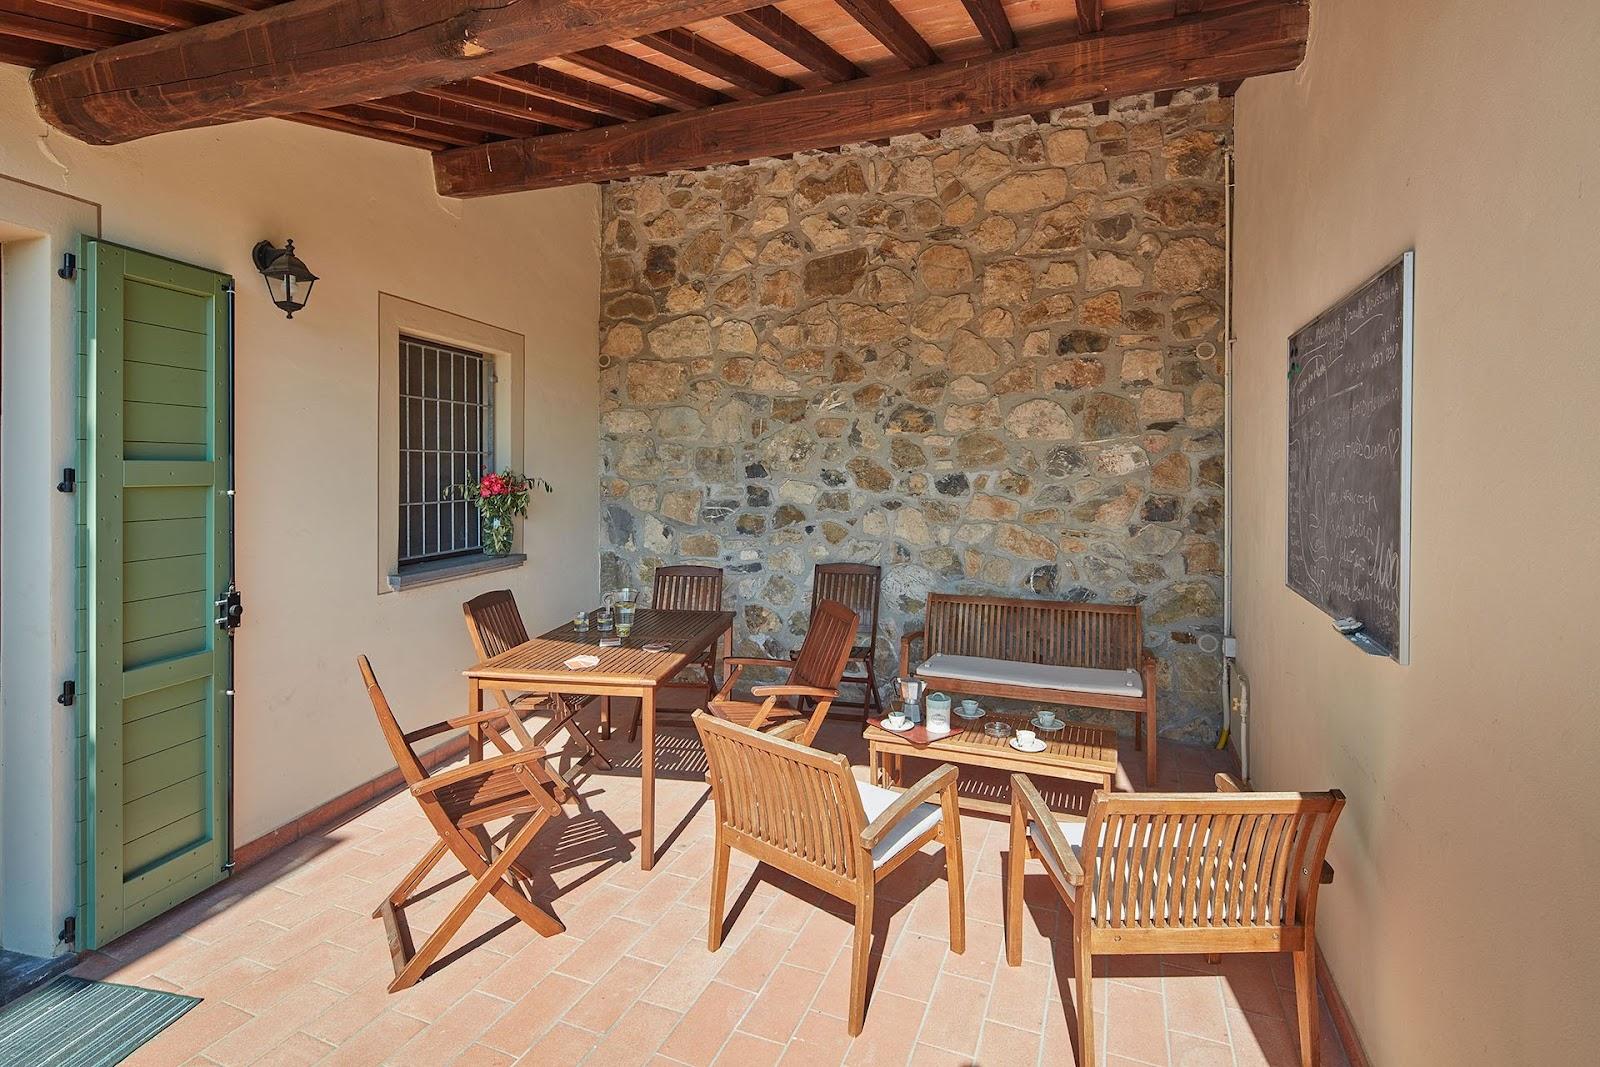 Ferienhaus Corte Paradiso (2570342), Monsummano Terme, Pistoia, Toskana, Italien, Bild 6